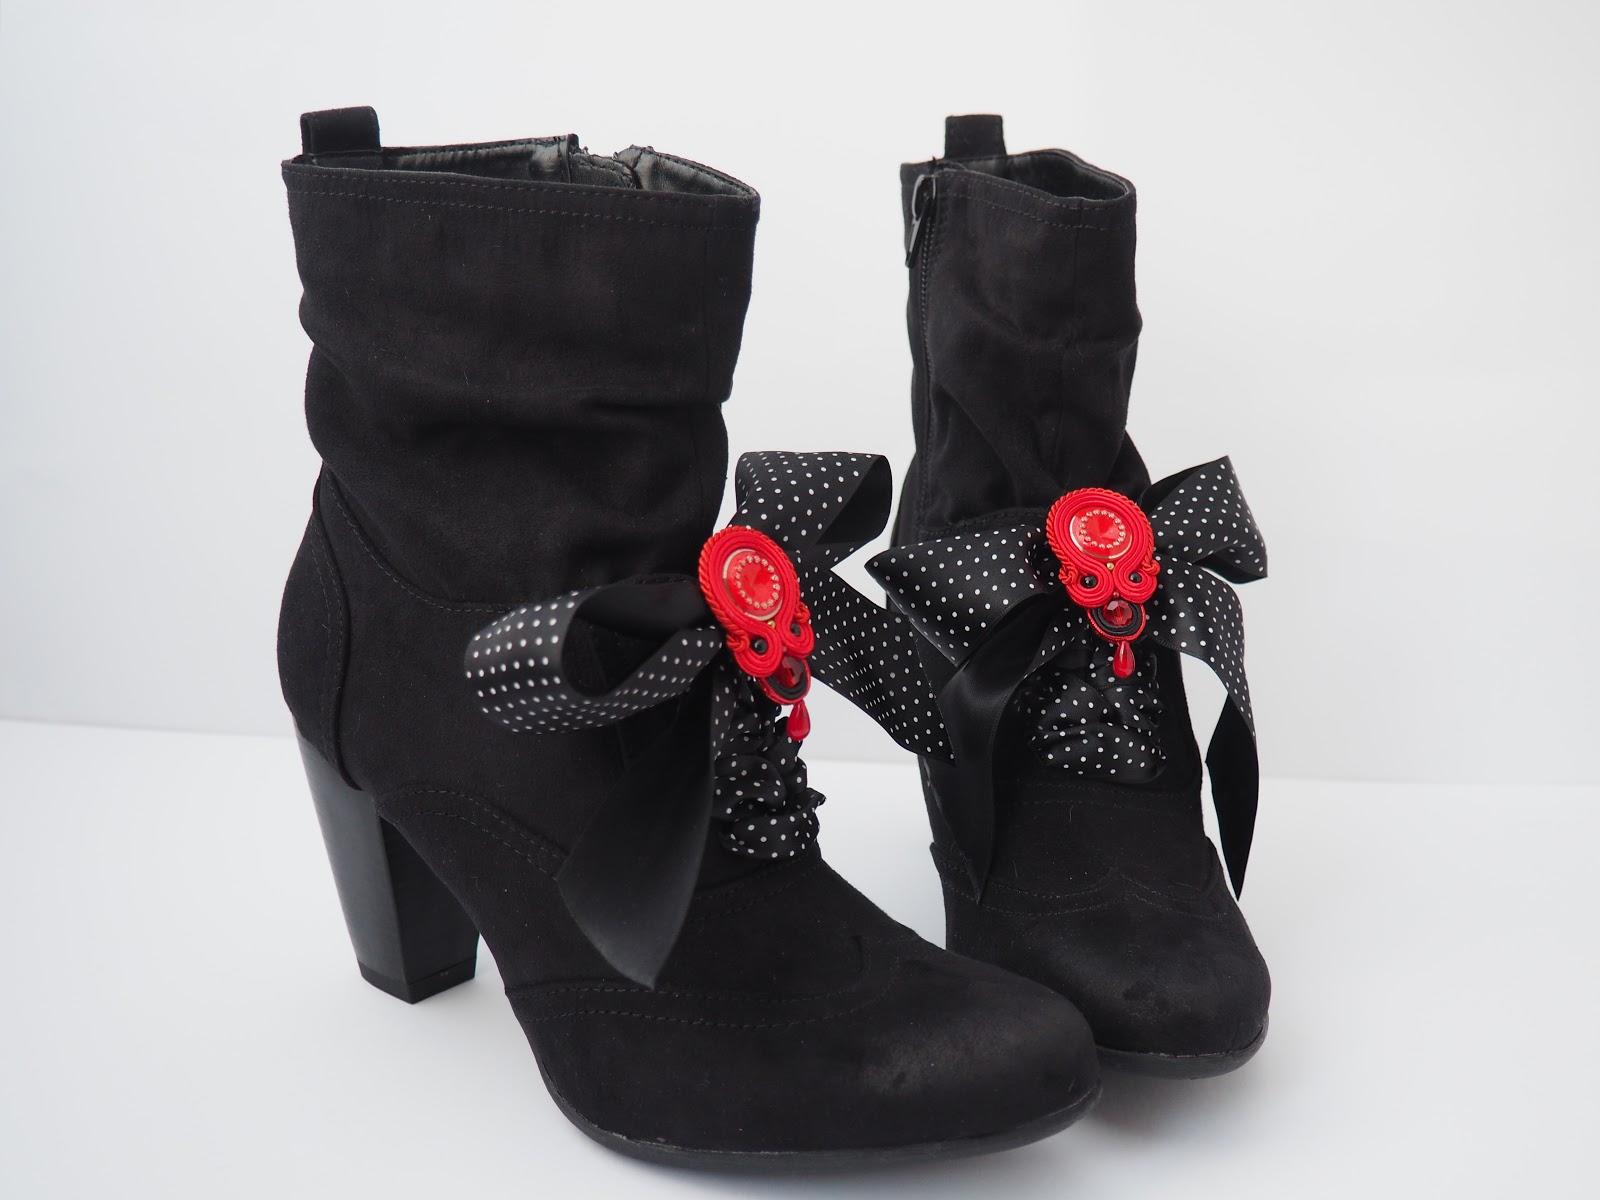 ankle boots, bows, brooch, Deichmann, man made, shoes, soutache, red, polka dot, vegan, Henderson's, Edinburgh, festive menu, pizza express, what vegans eat, what vegans wear, Tocha's World